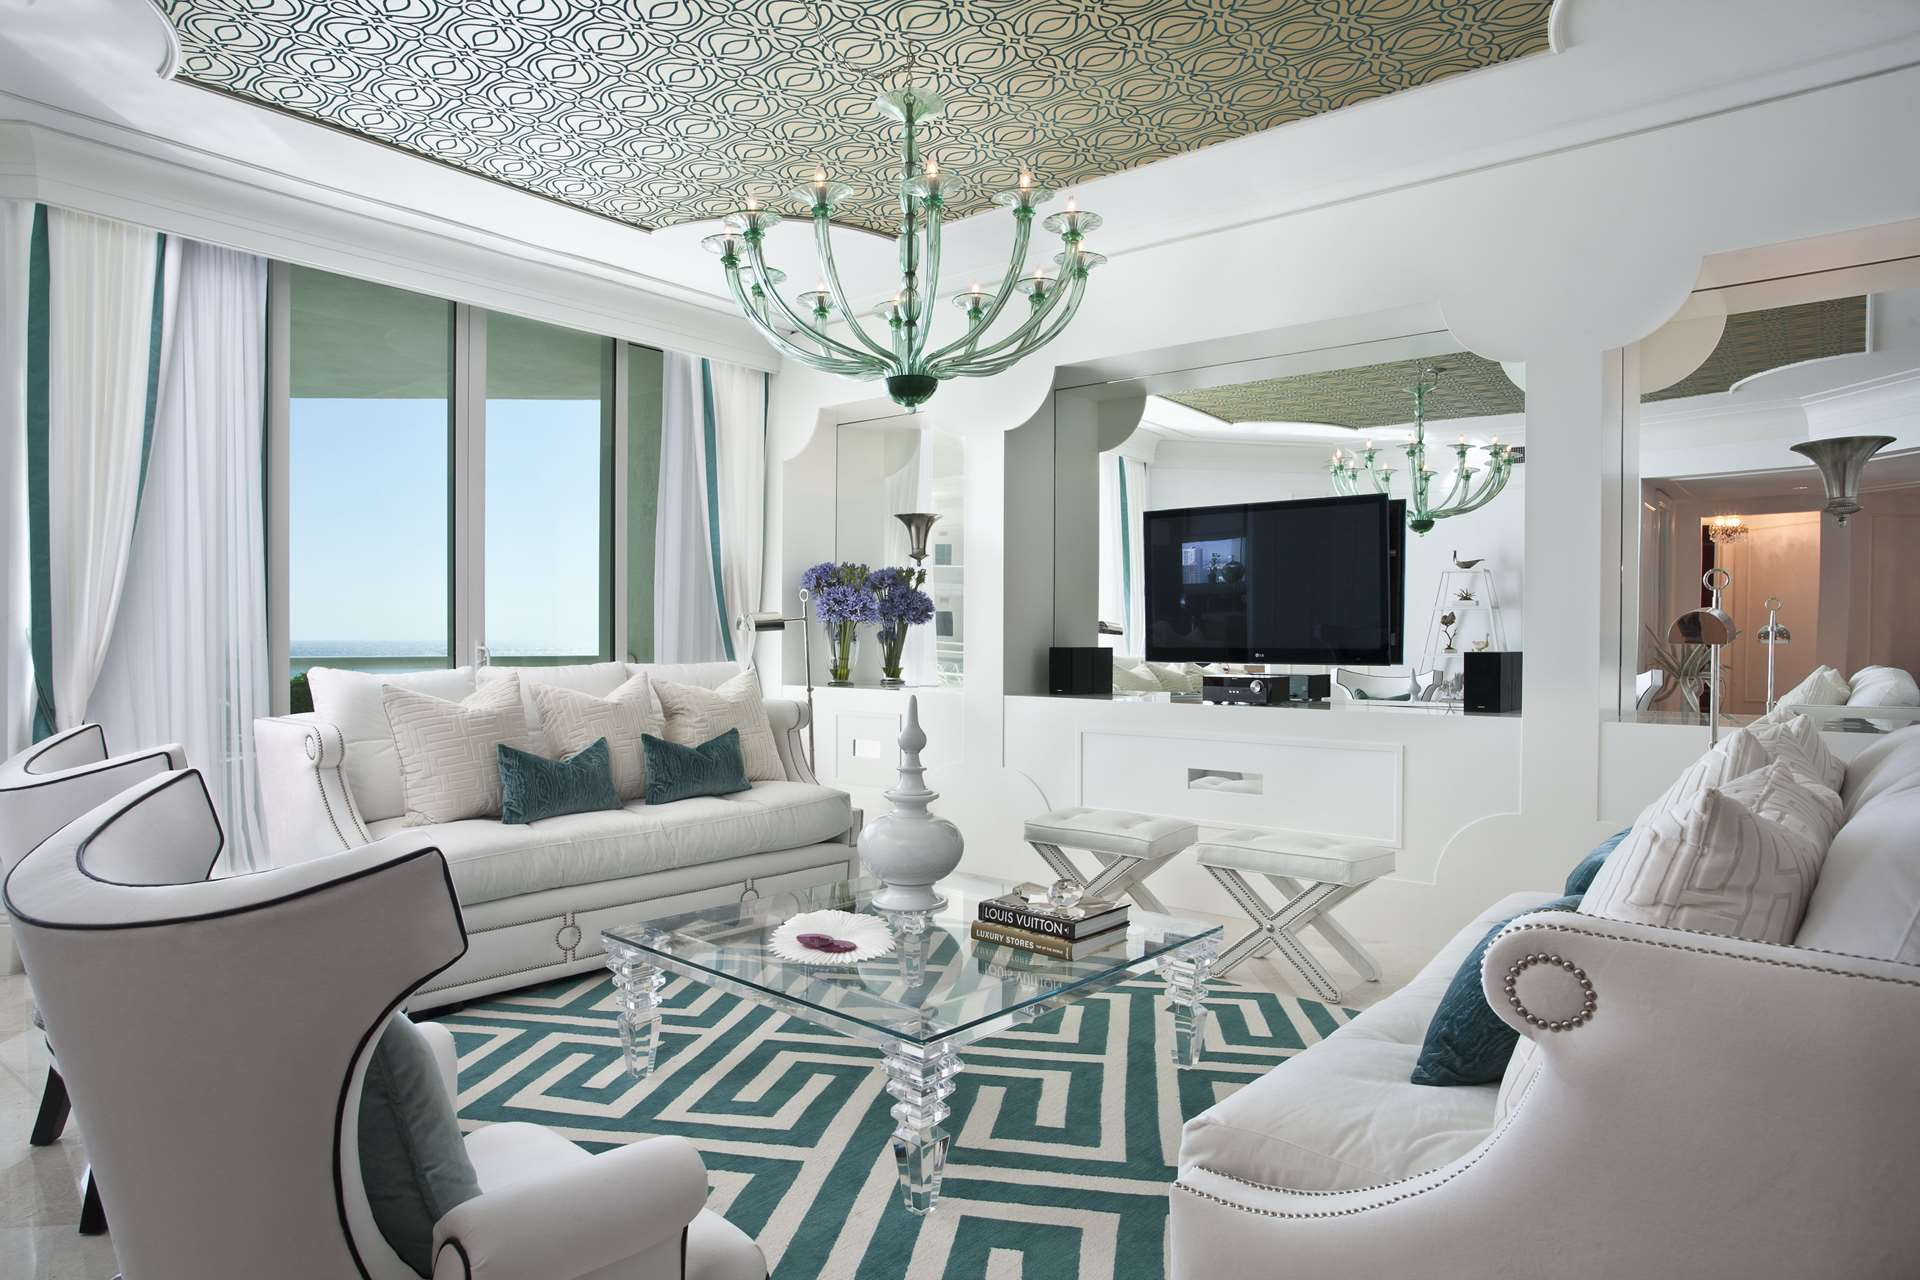 Hollywood Regency Furniture On A Budget #29: Hollywood-Regency-15